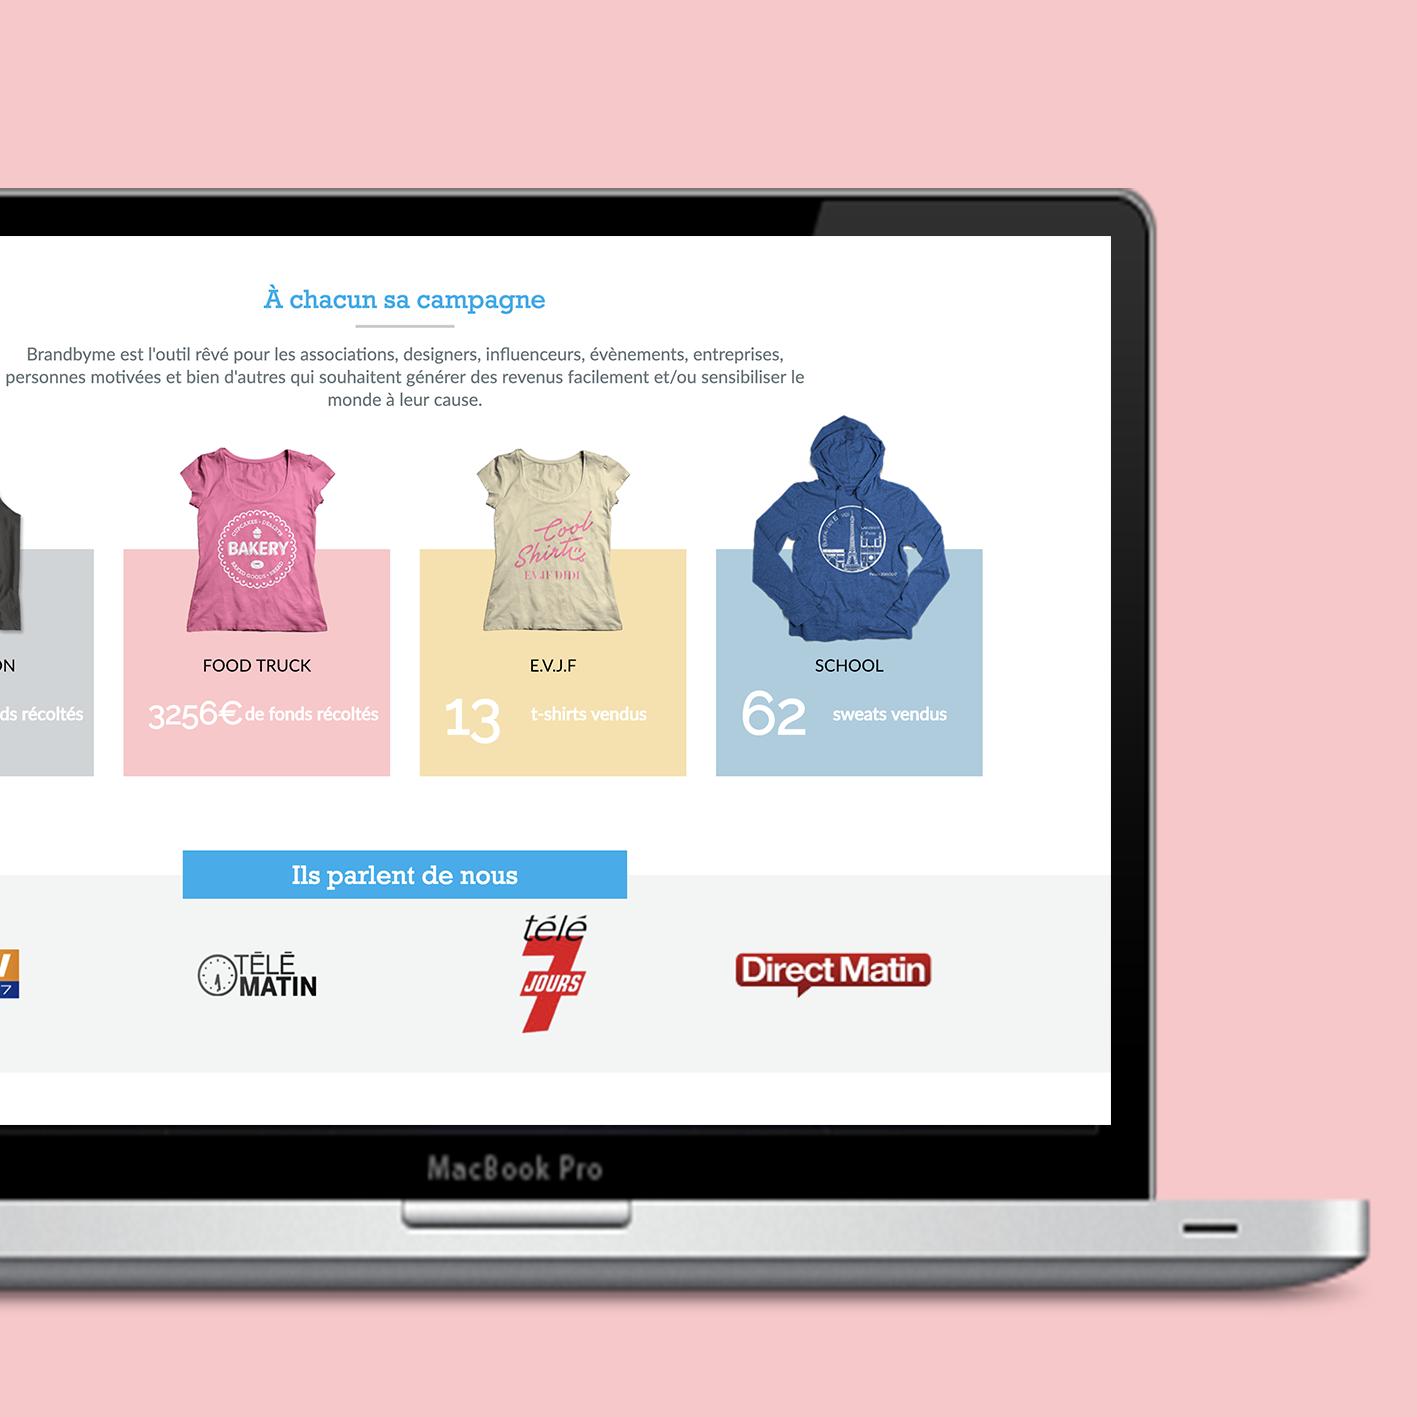 brandbyme creation sur mesure symfony react php likeweb agency paris studio design developpement